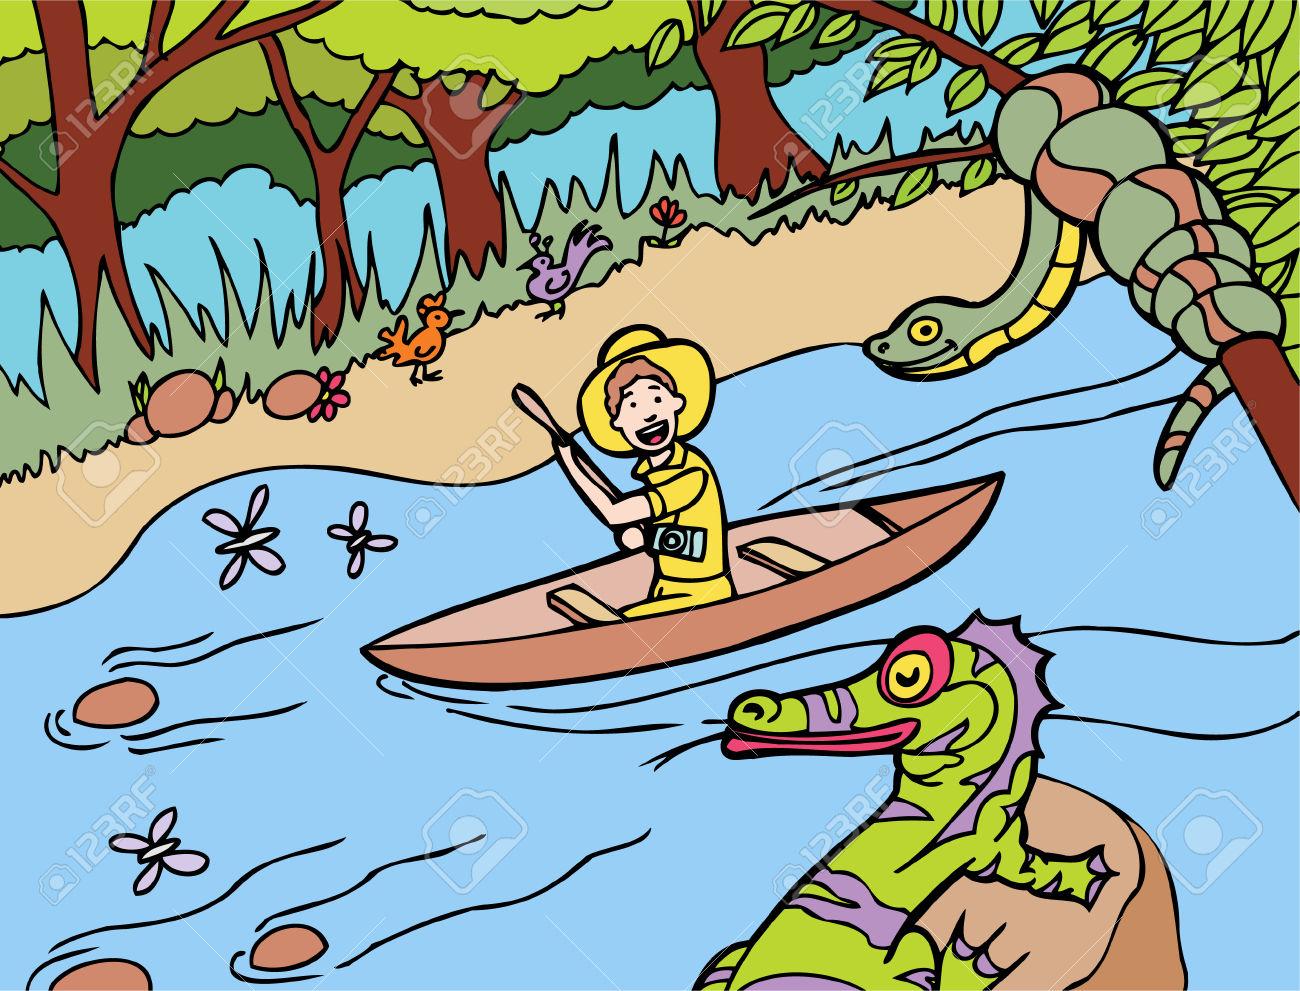 amazon river: amazon river